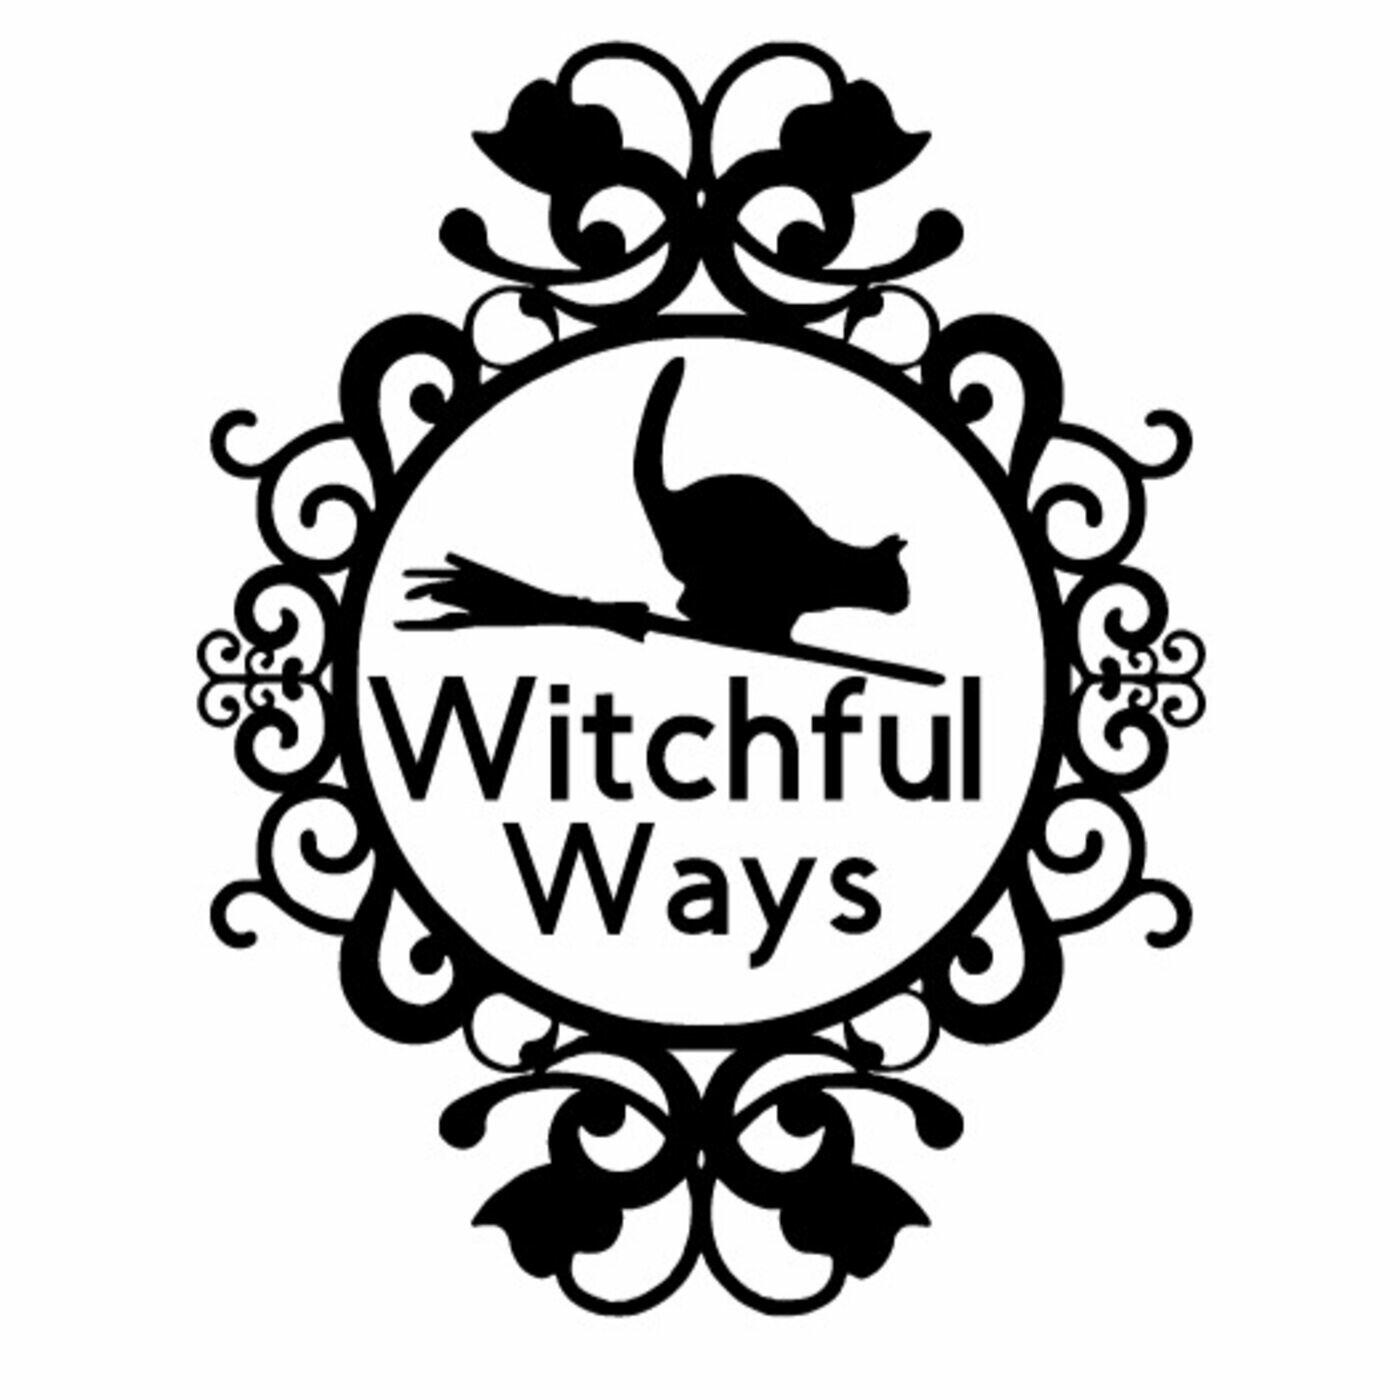 Witchful Ways